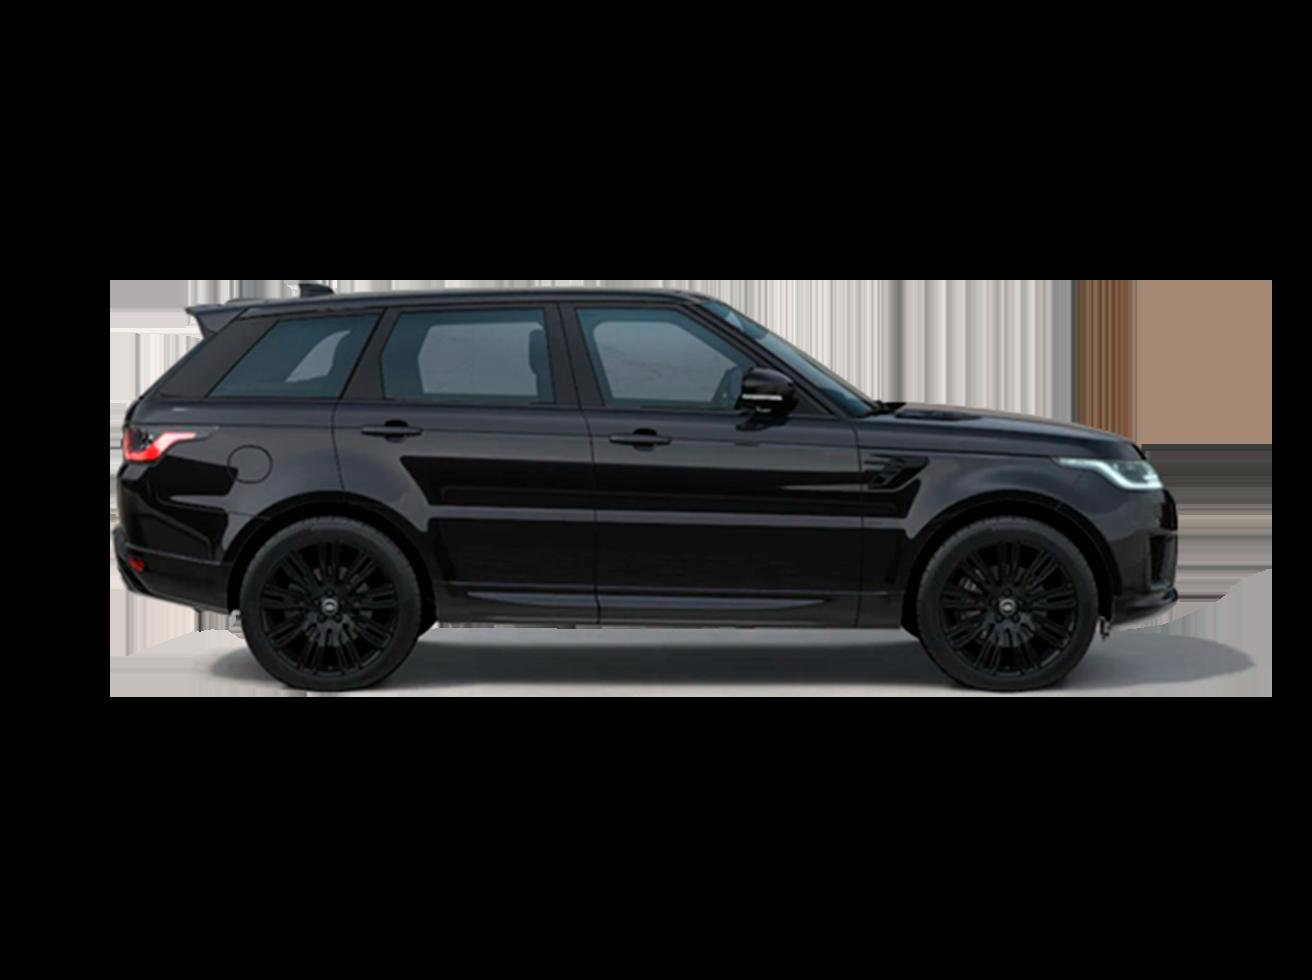 3.0 D300 TURBO DIESEL HSE DYNAMIC BLACK AUTOMÁTICO